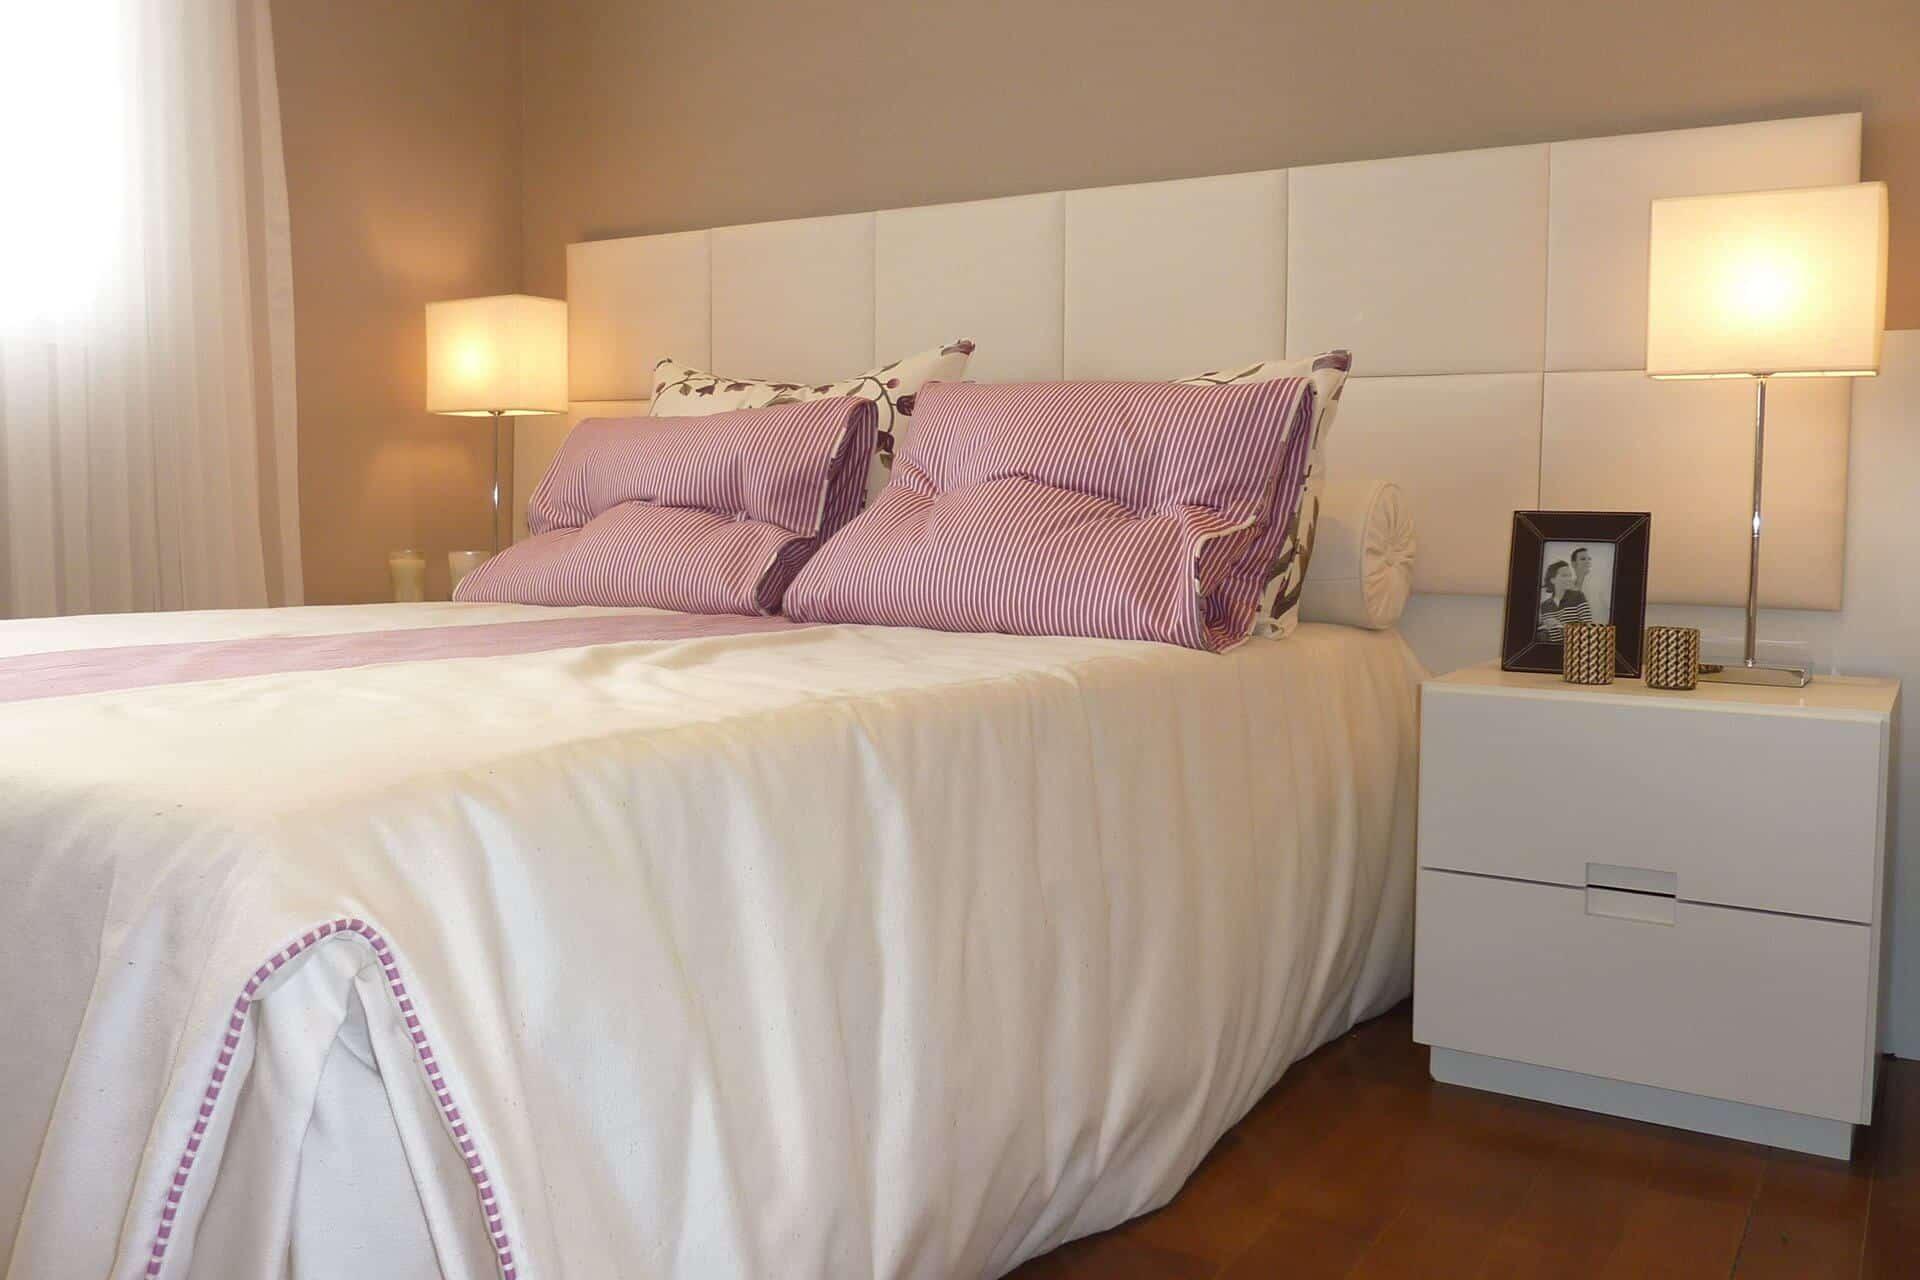 dormitorio-planejado_moveis-sob-medida-galeria-127